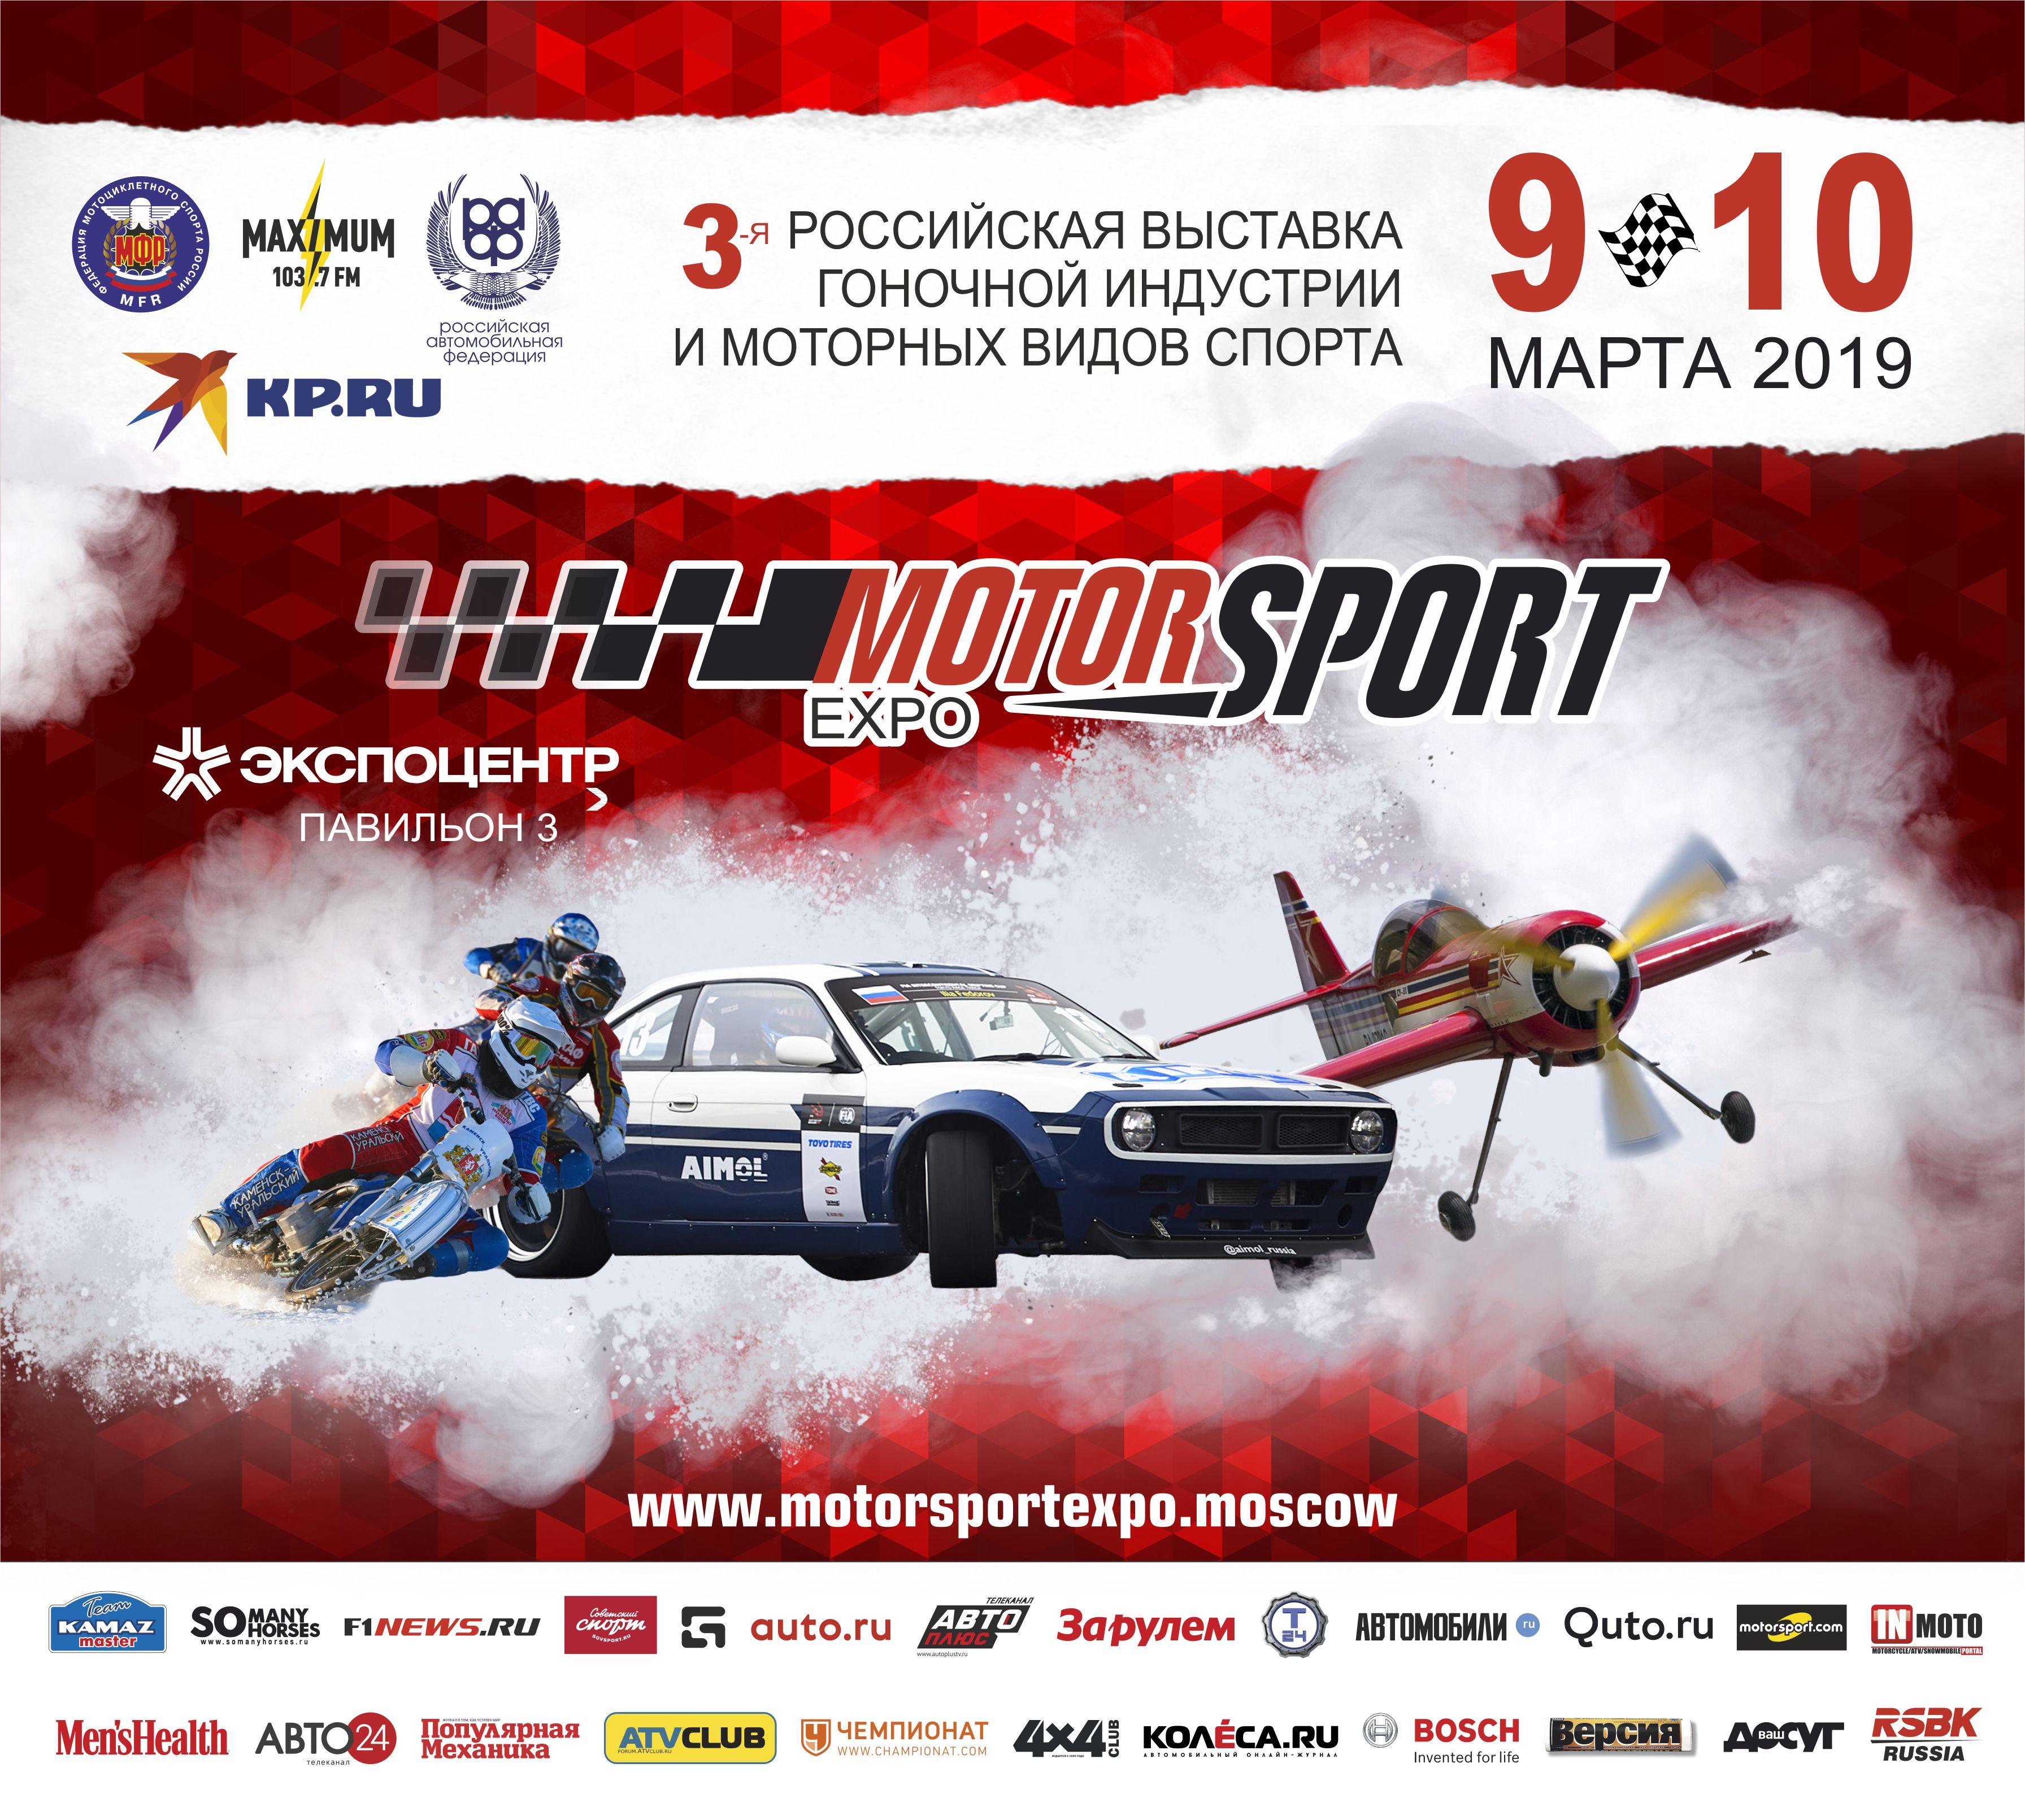 Motorsport Expo-2019: все самые быстрые в центре Москвы!